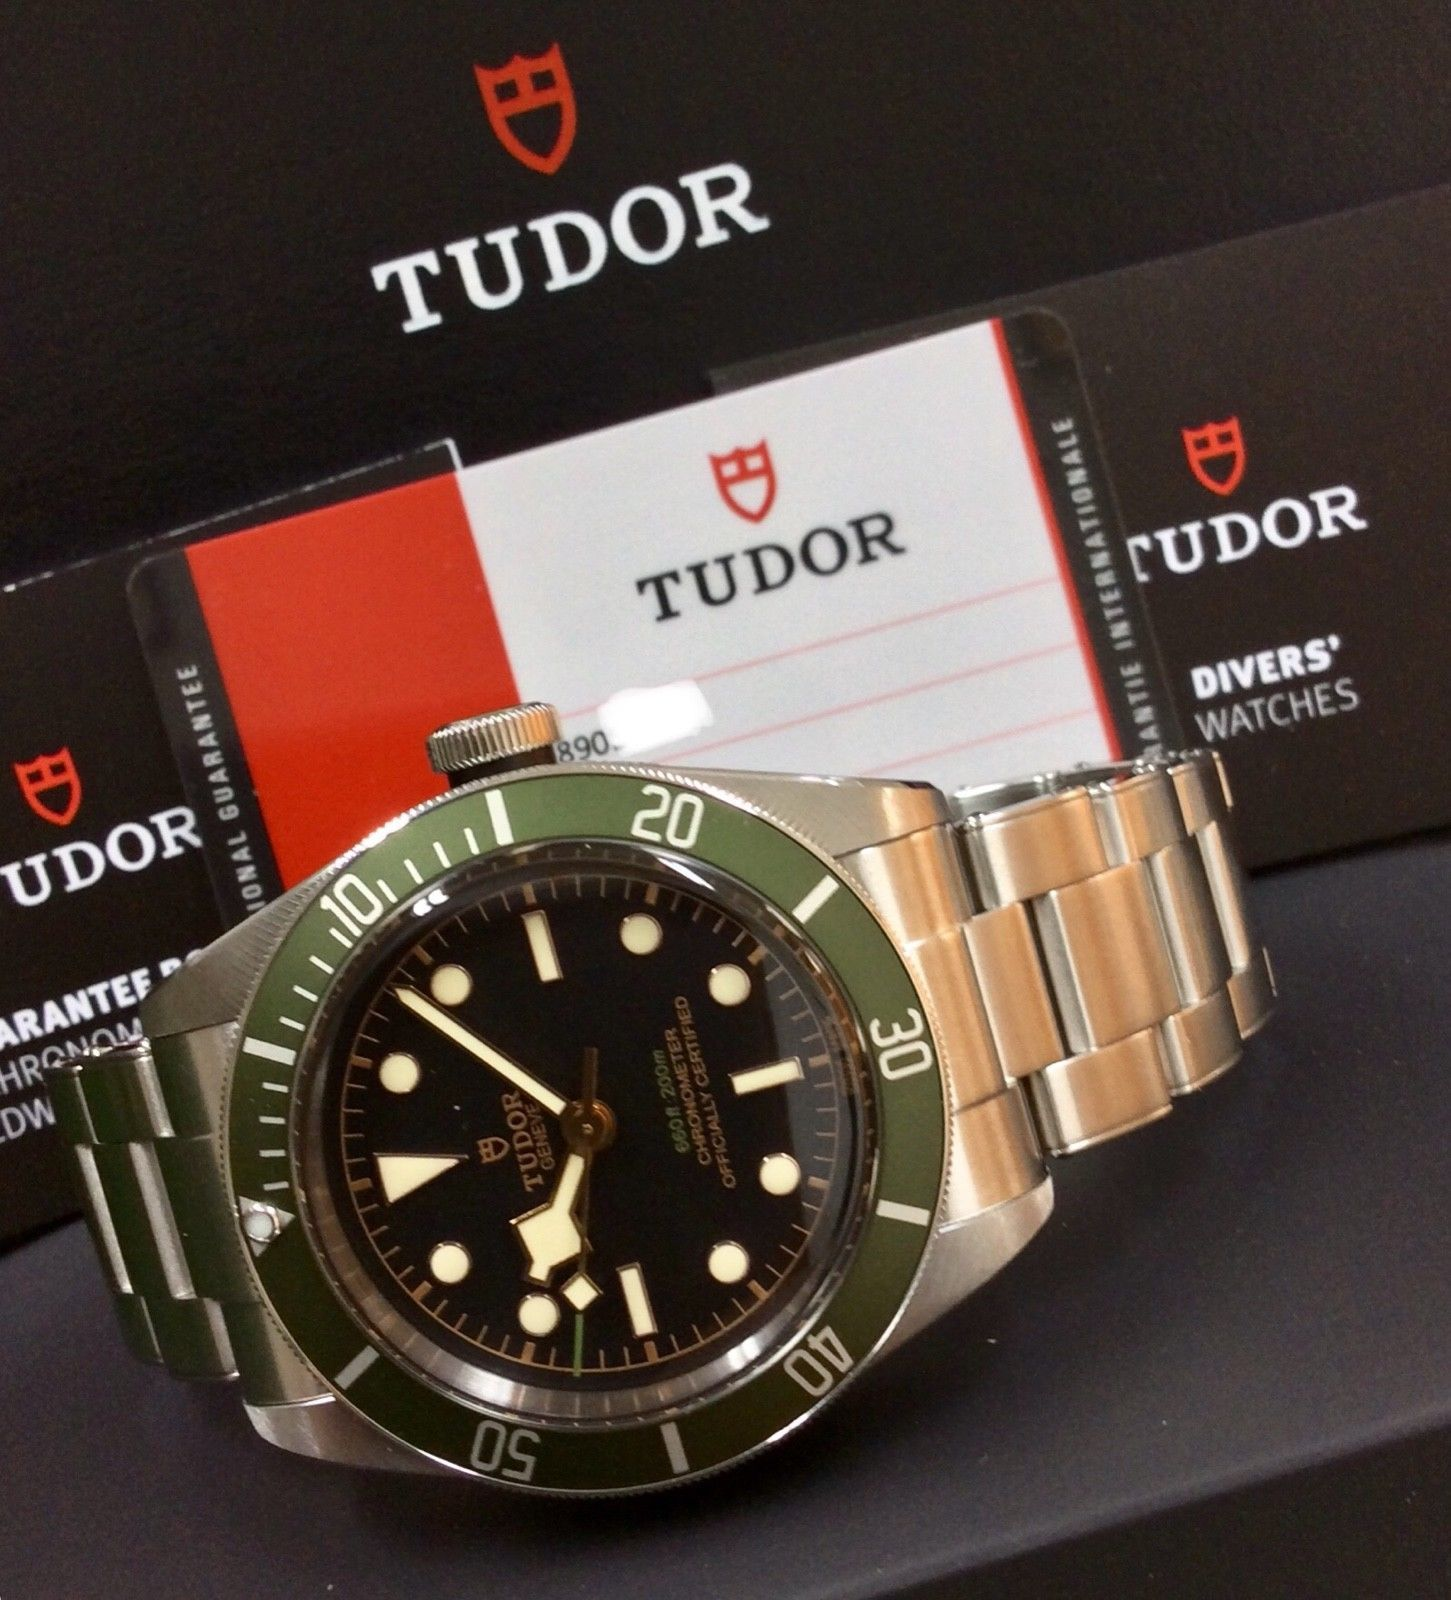 b1d5dbbed56 Tudor Black Bay Harrods Edition- 79230G Beat the 3 year waiting list!  STUNNING